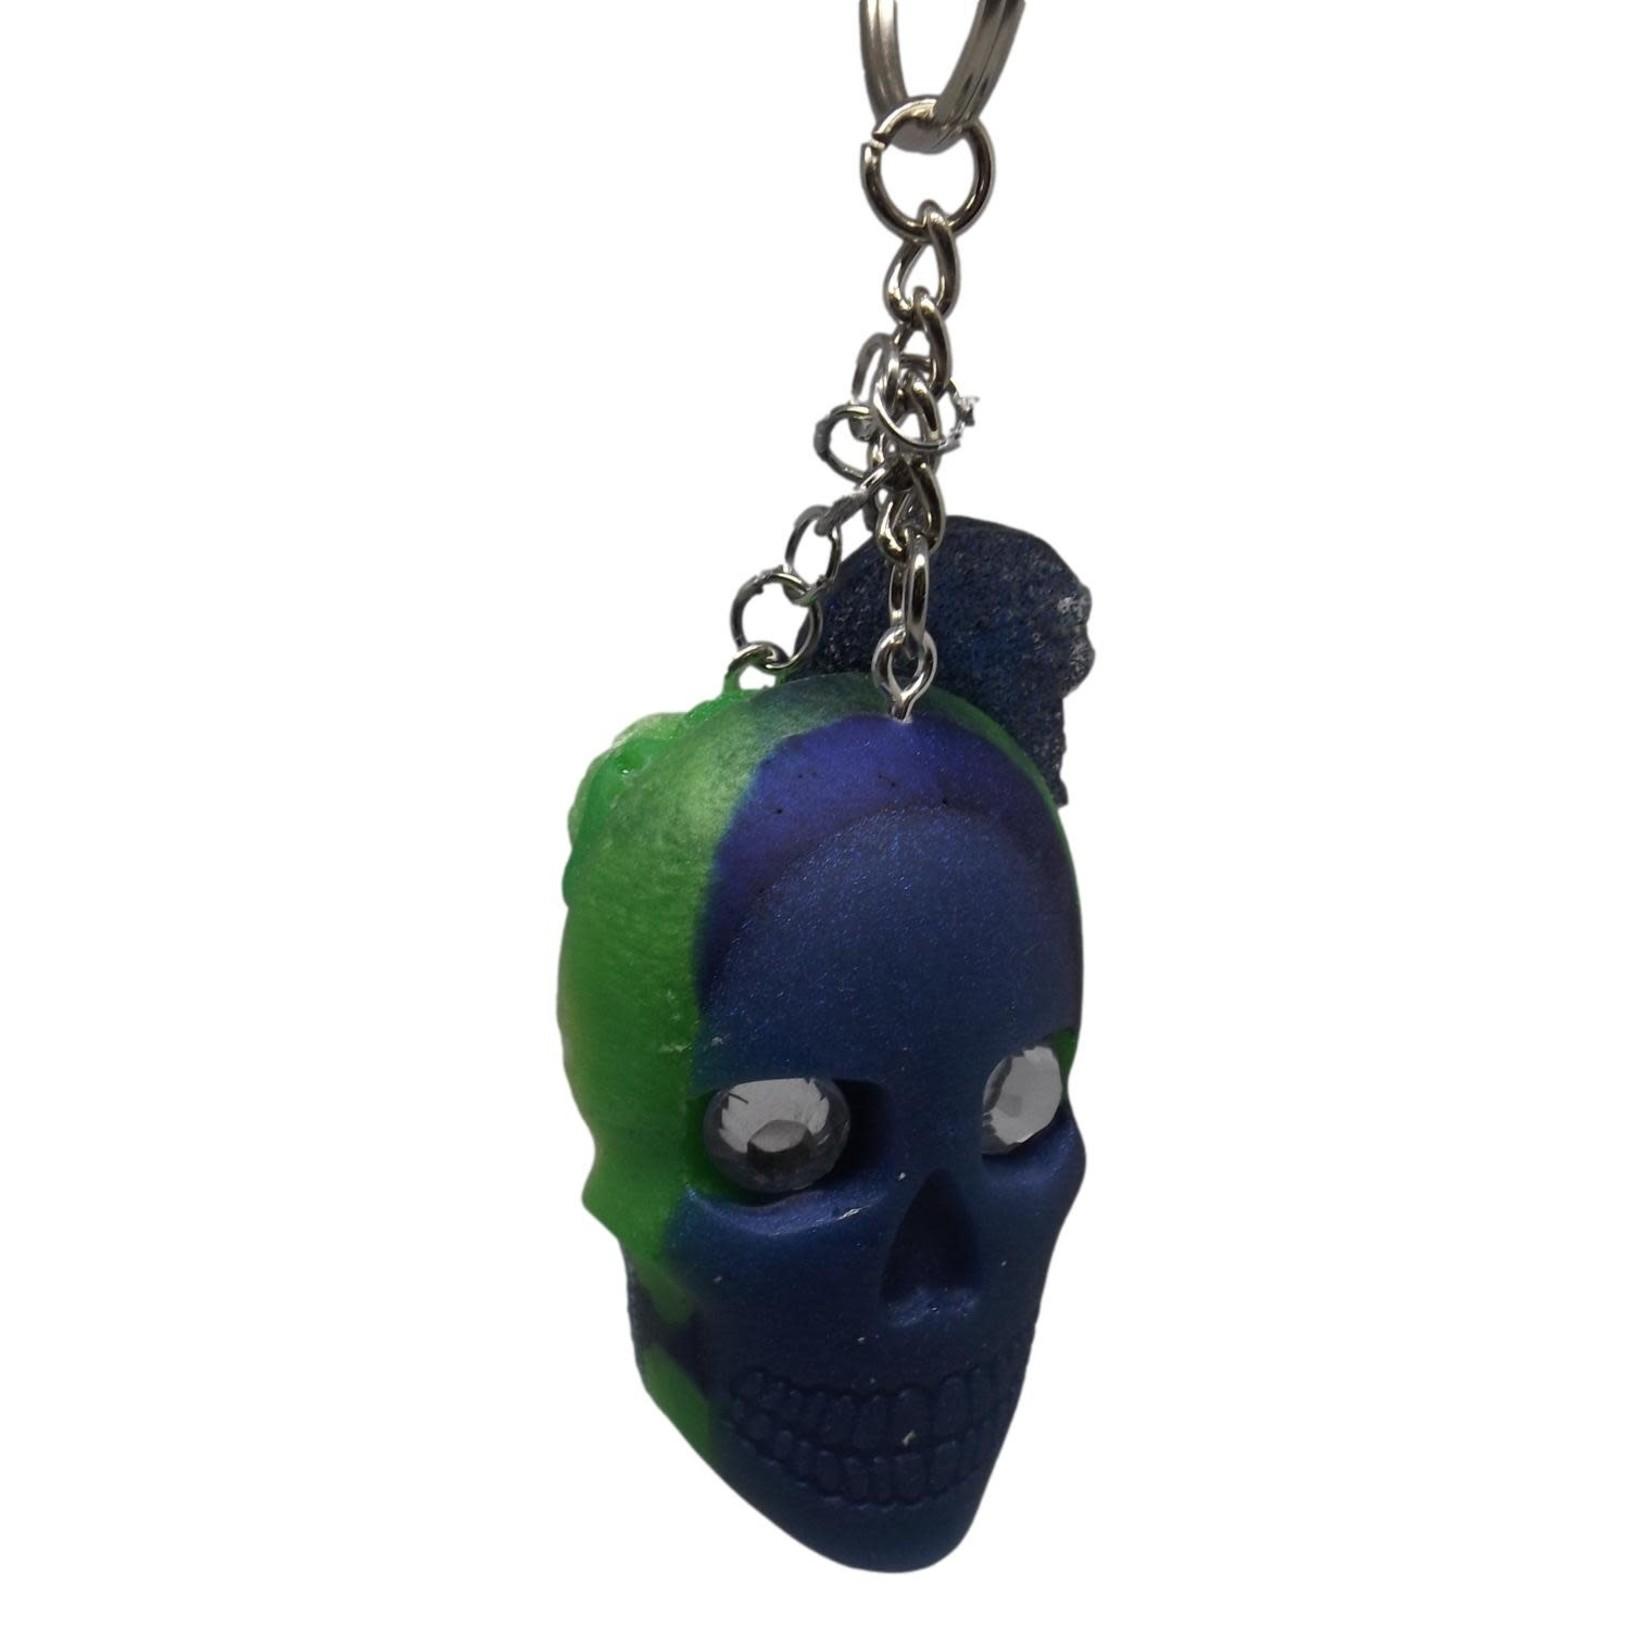 East Coast Sirens Blue & Green Skull Keychain